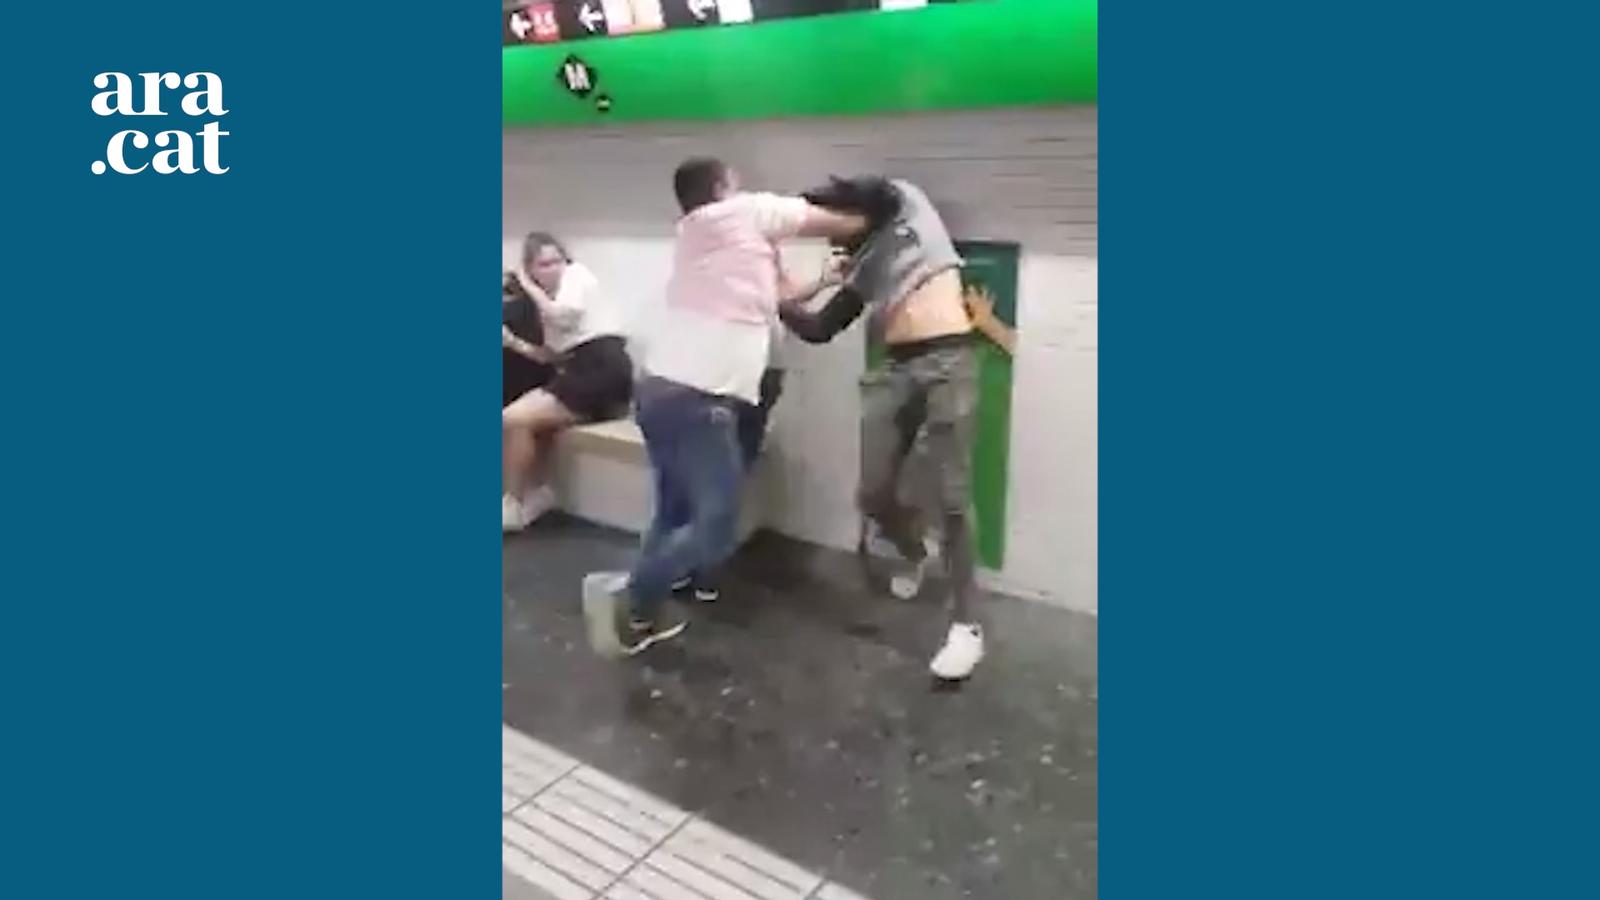 Agressió a un carterista al metro de Barcelona